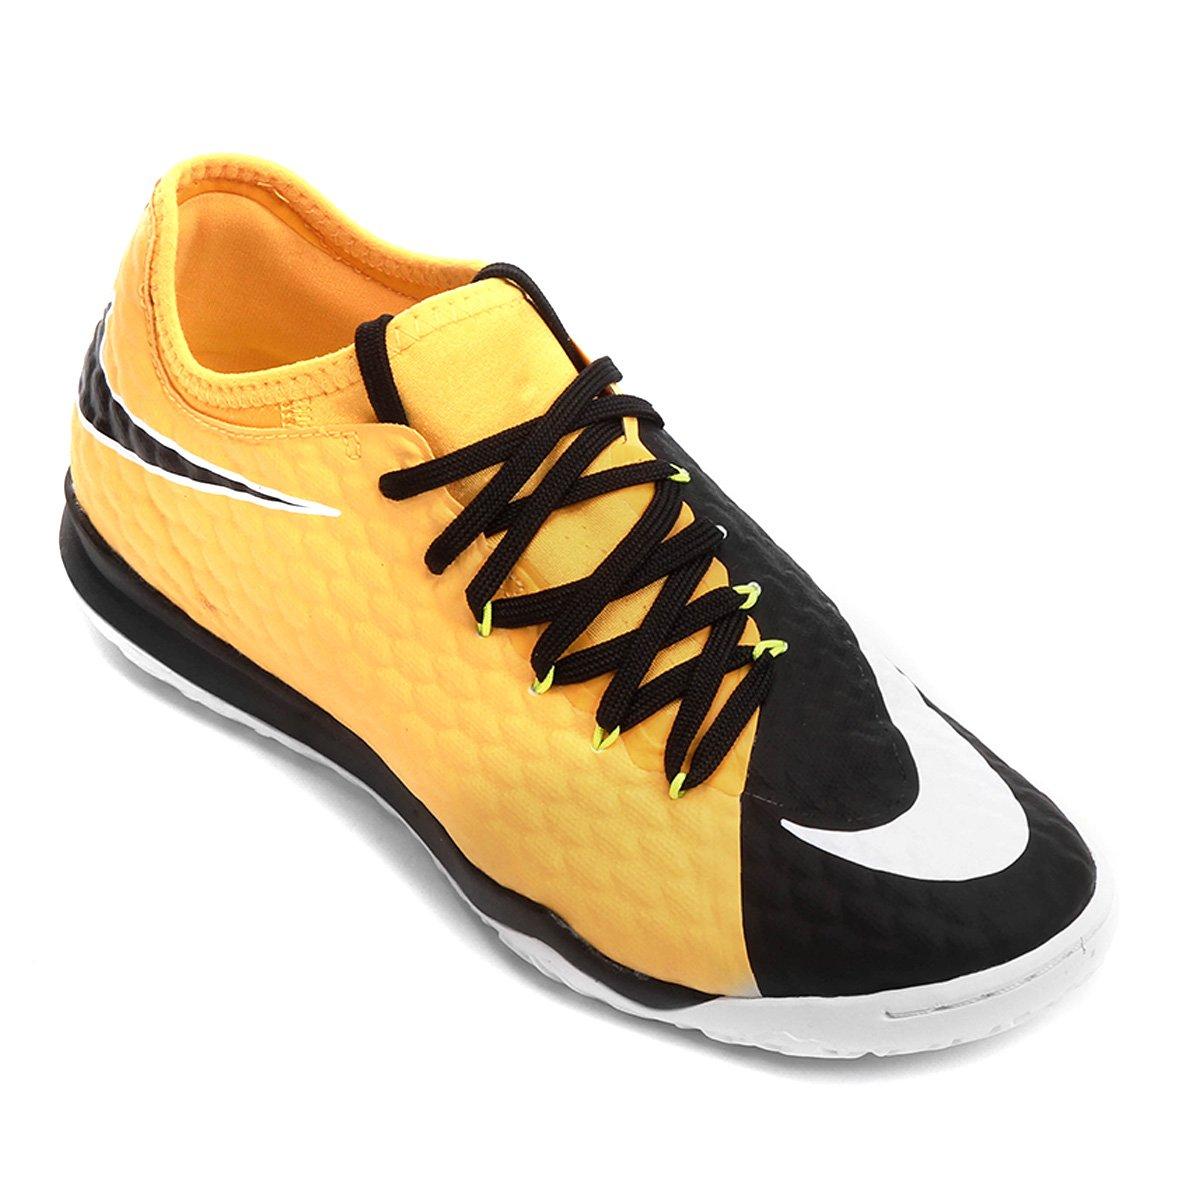 Chuteira Futsal Nike Hypervenom Finale 2 IC - Compre Agora  ae4bf137ef1